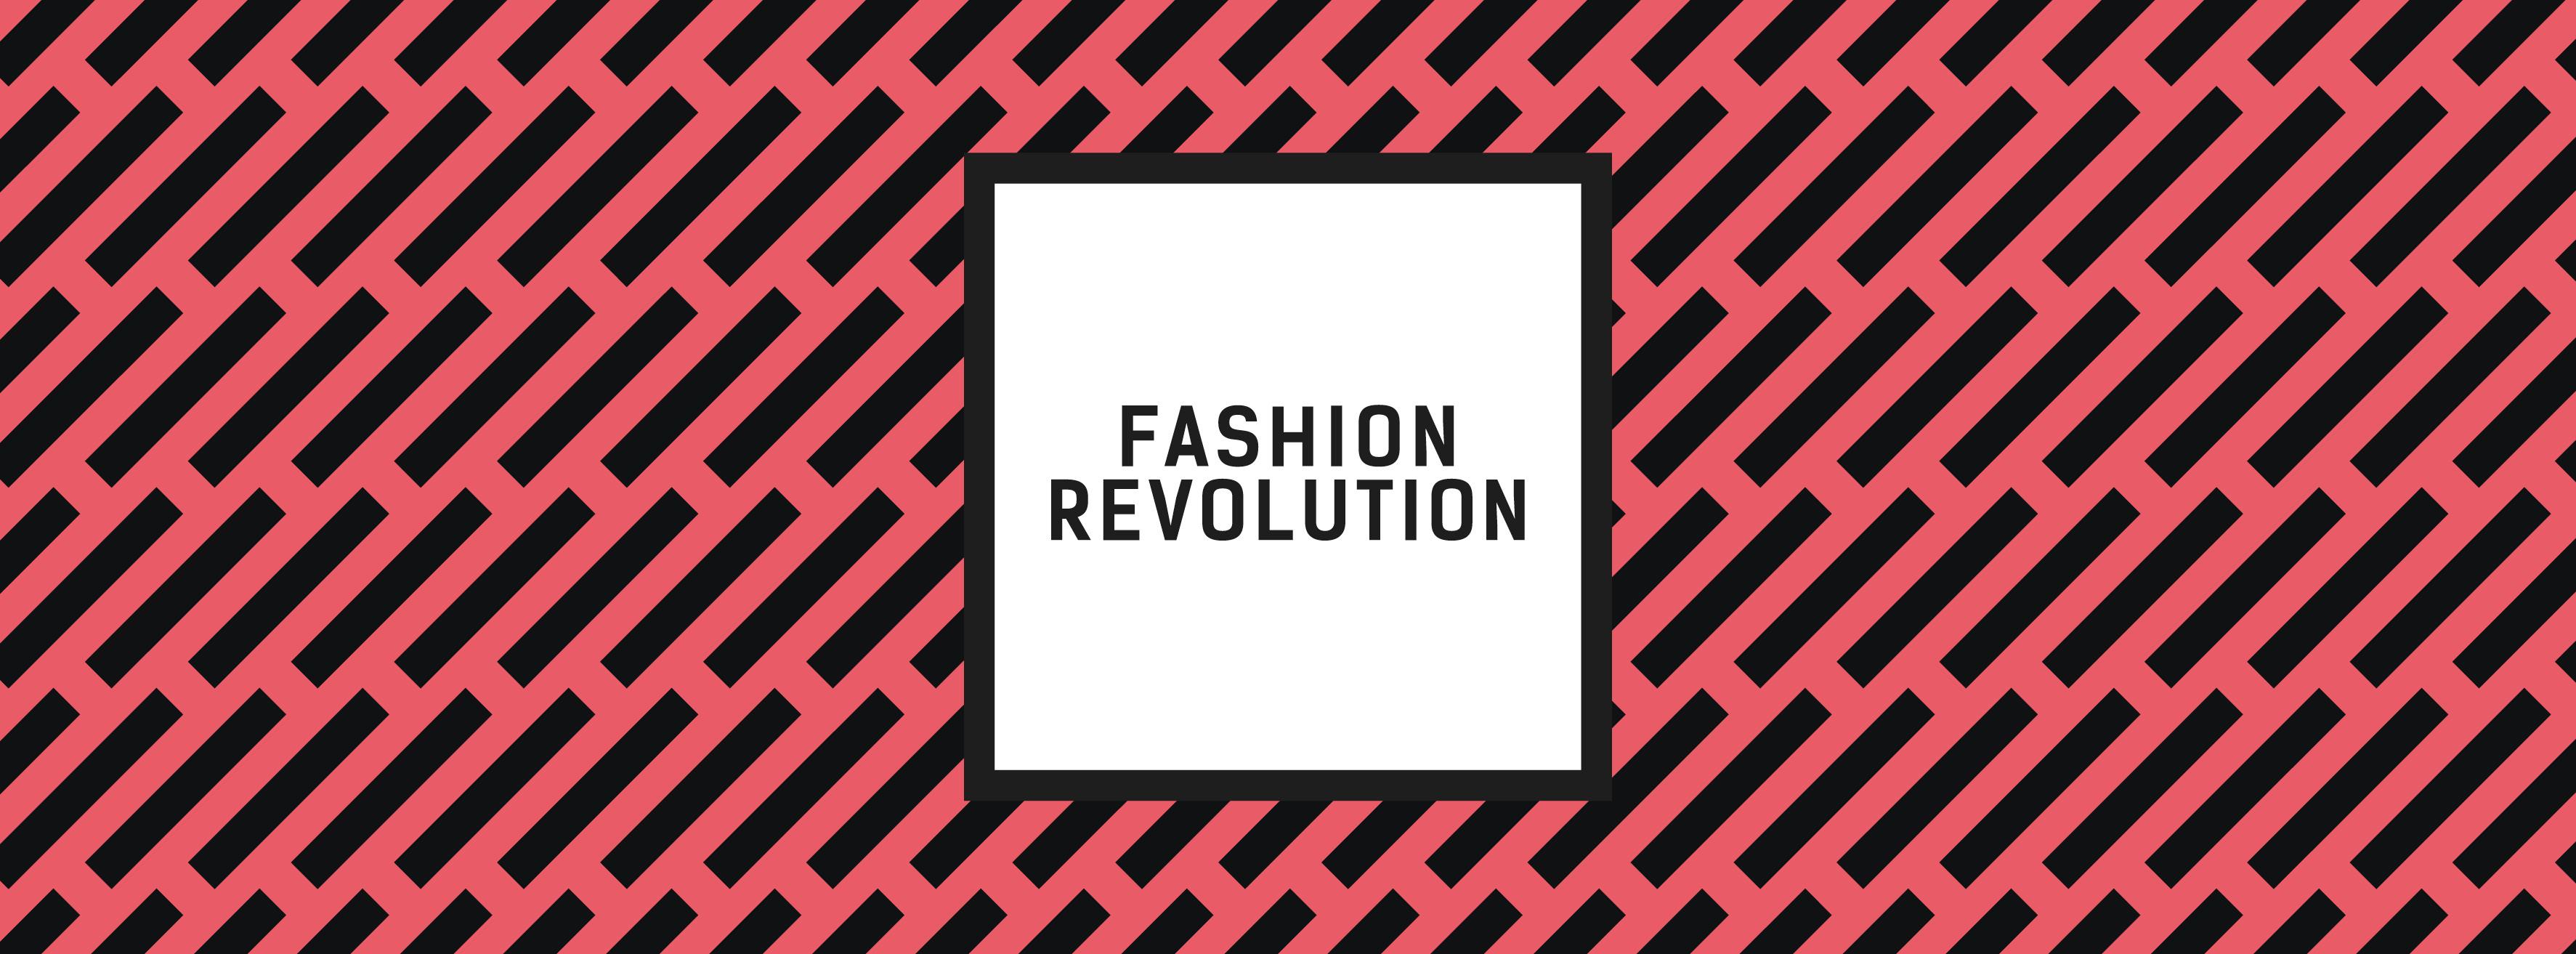 fashion-revolution